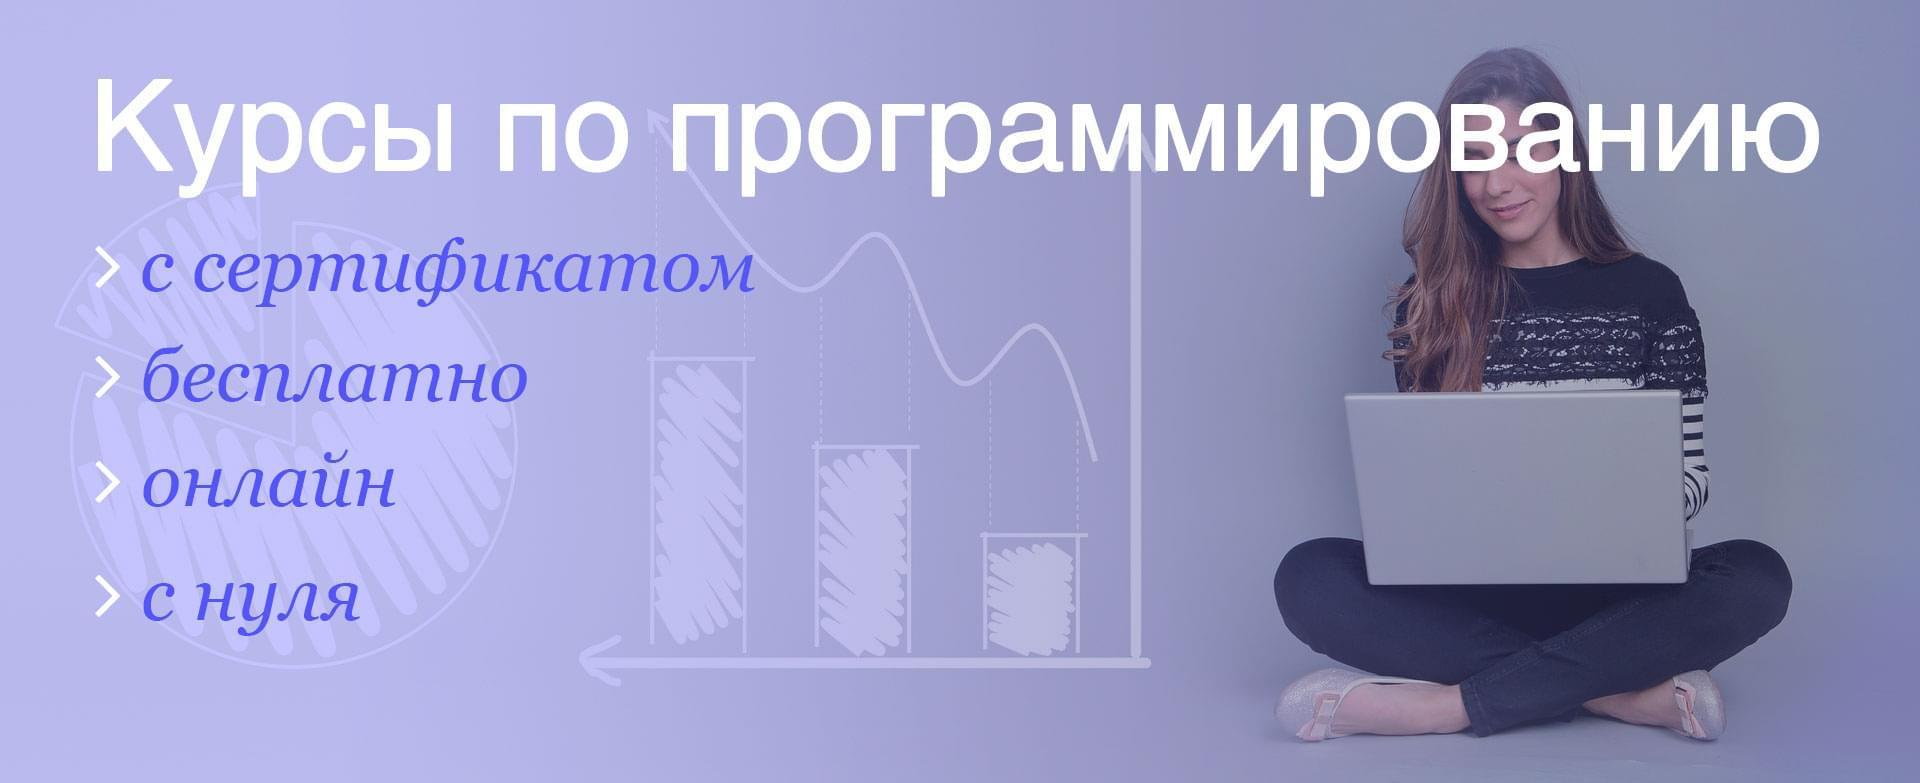 kursy-po-programirovaniu-besplatno